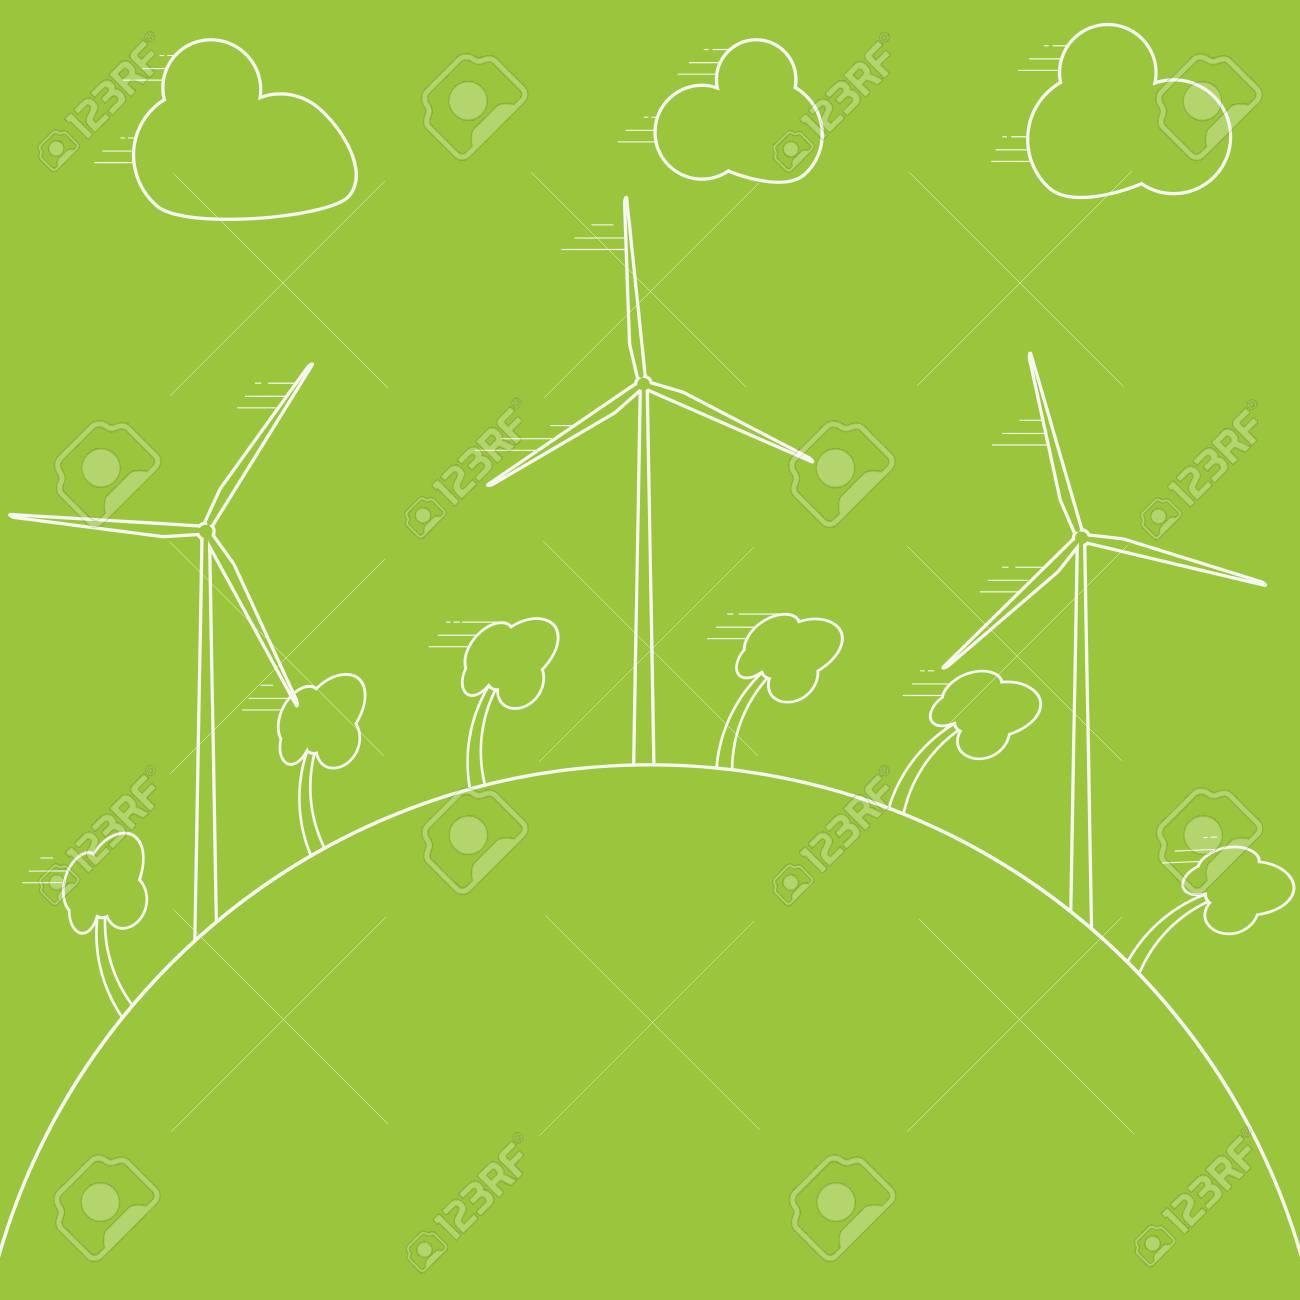 Green Eco Concept Wind Energy Generators Vector Diagram Also Power Generator Diagrams On Turbine Illustration Alternative